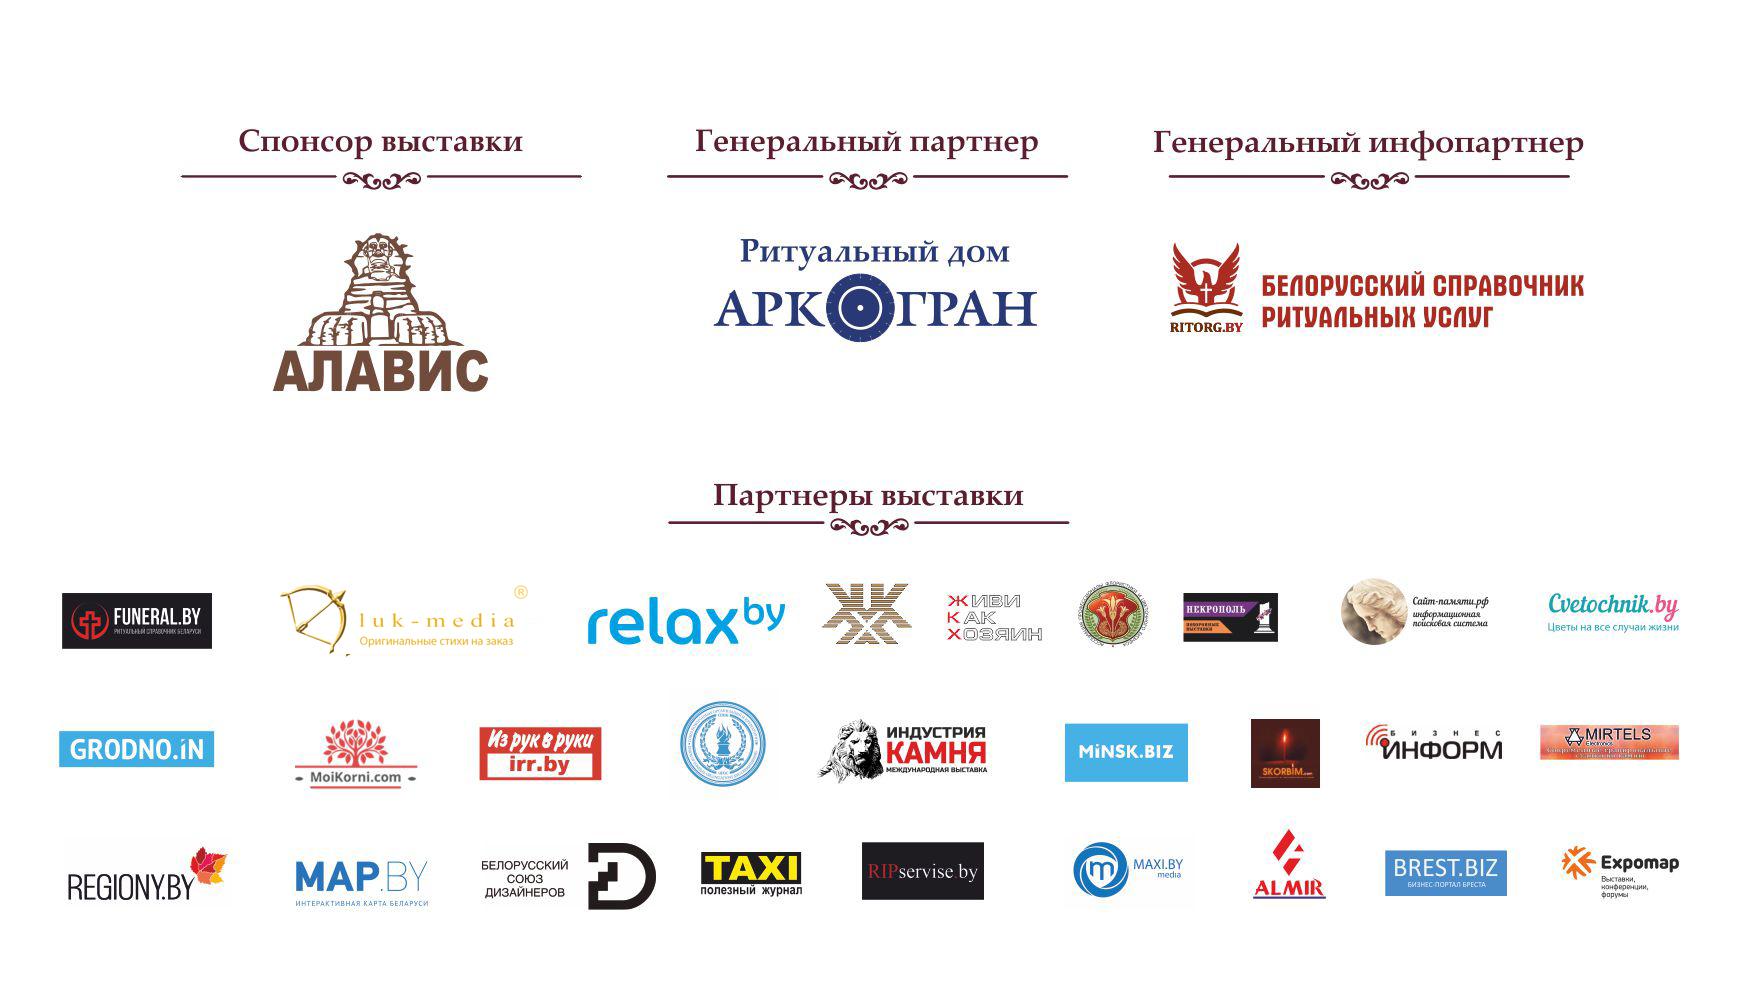 мемориал 2015 минск программа